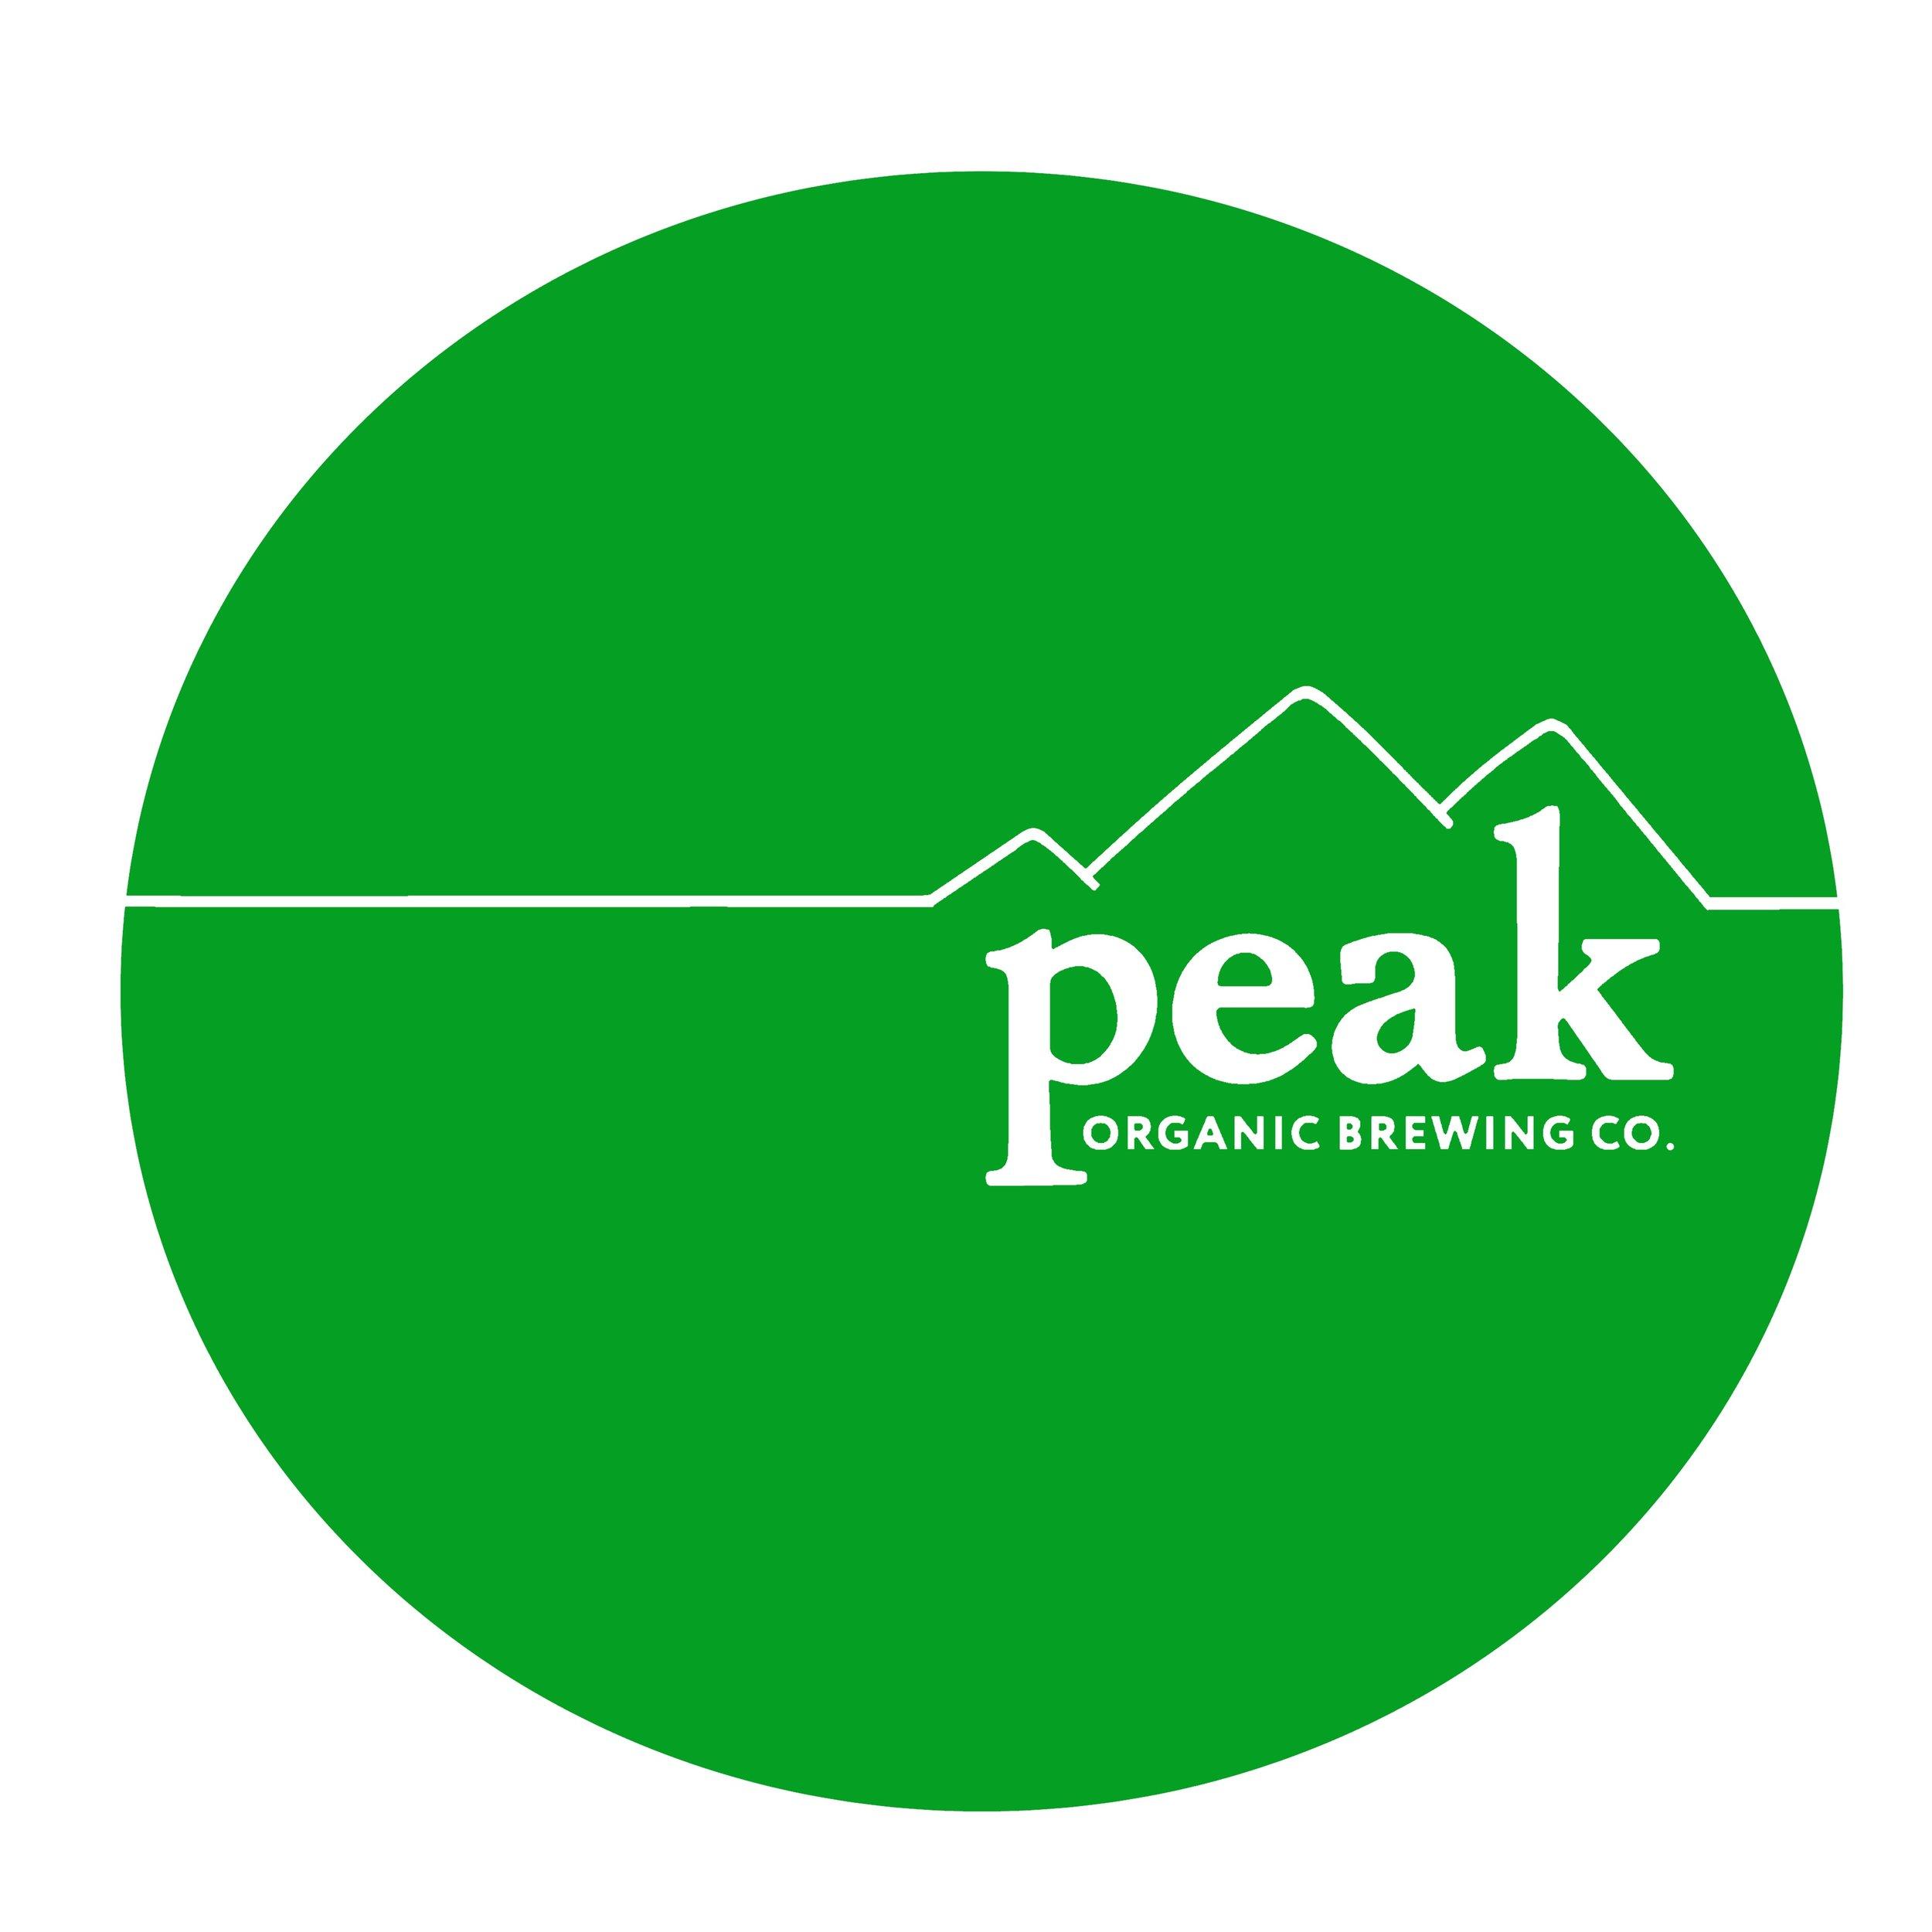 Peak Line Logo - Green 3 (#049F23).jpg